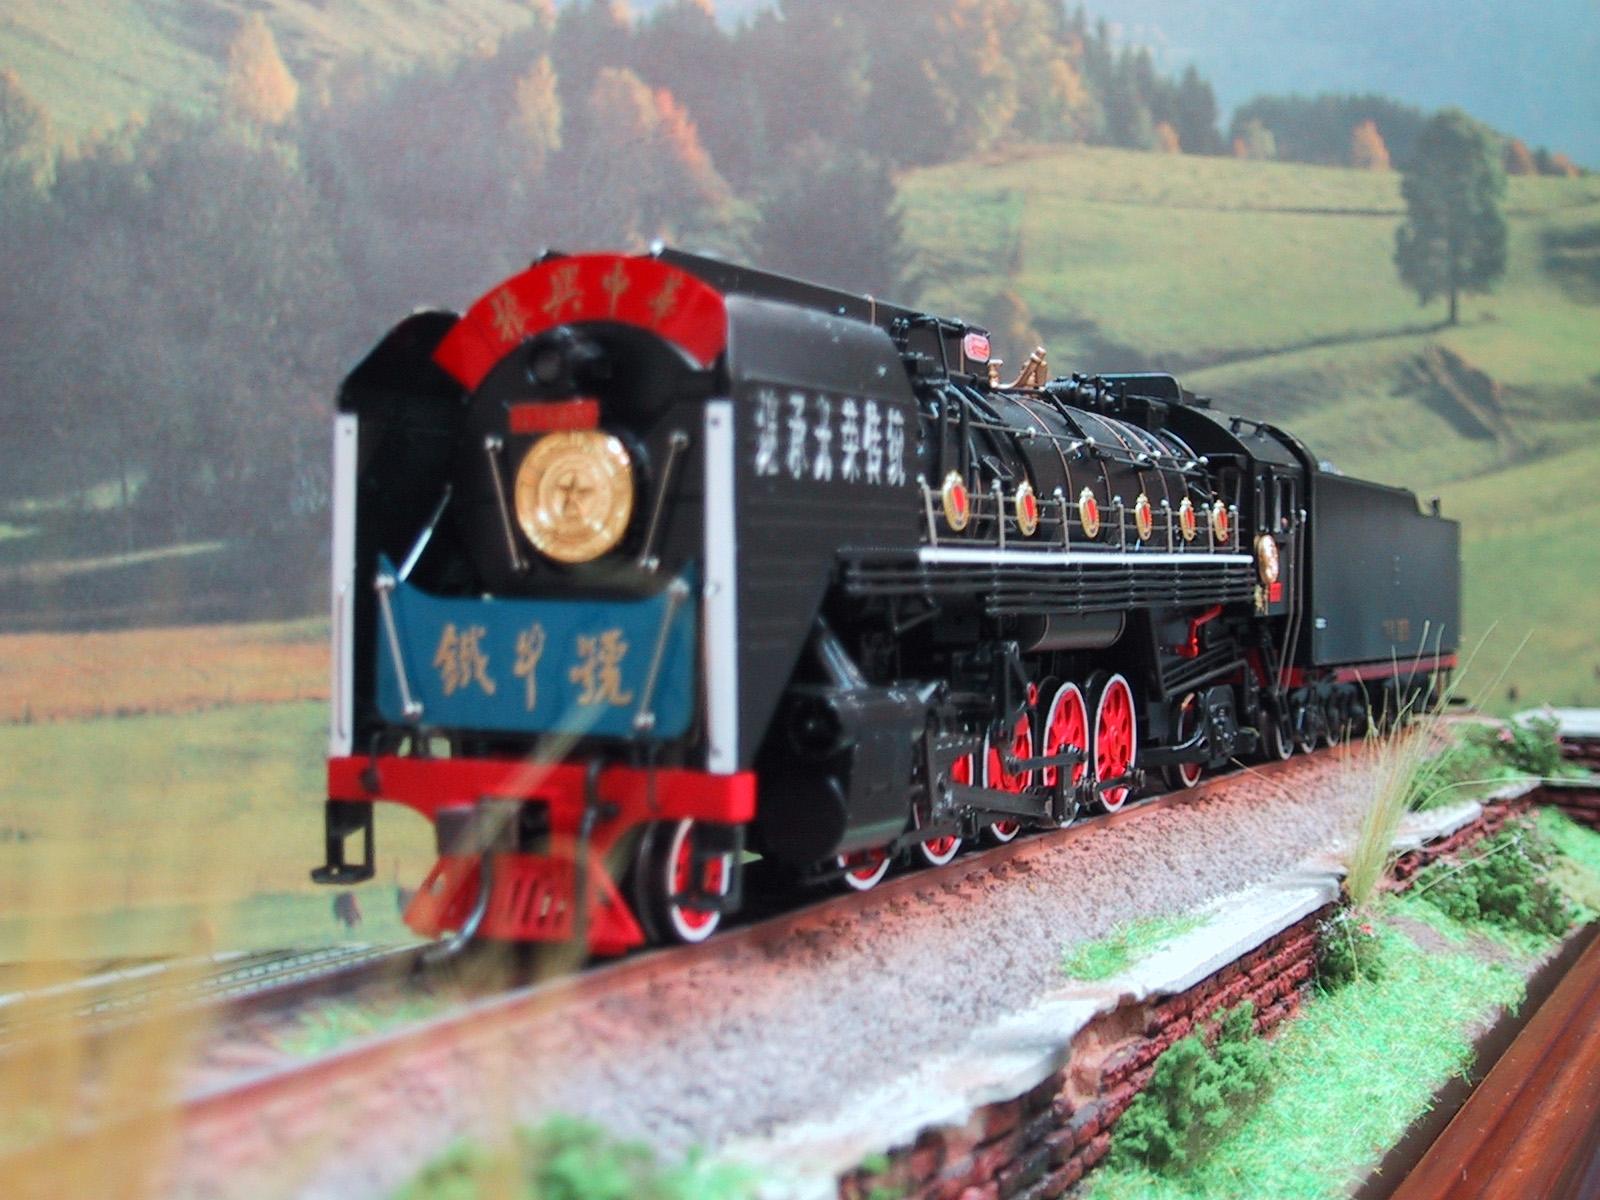 Bachmann-Spectrum CT00302 - QJ12WT, Chin. D-Lok QJ, Santa Fe Class, 2-10-2, 'Iron Bull', Nr.6800.1